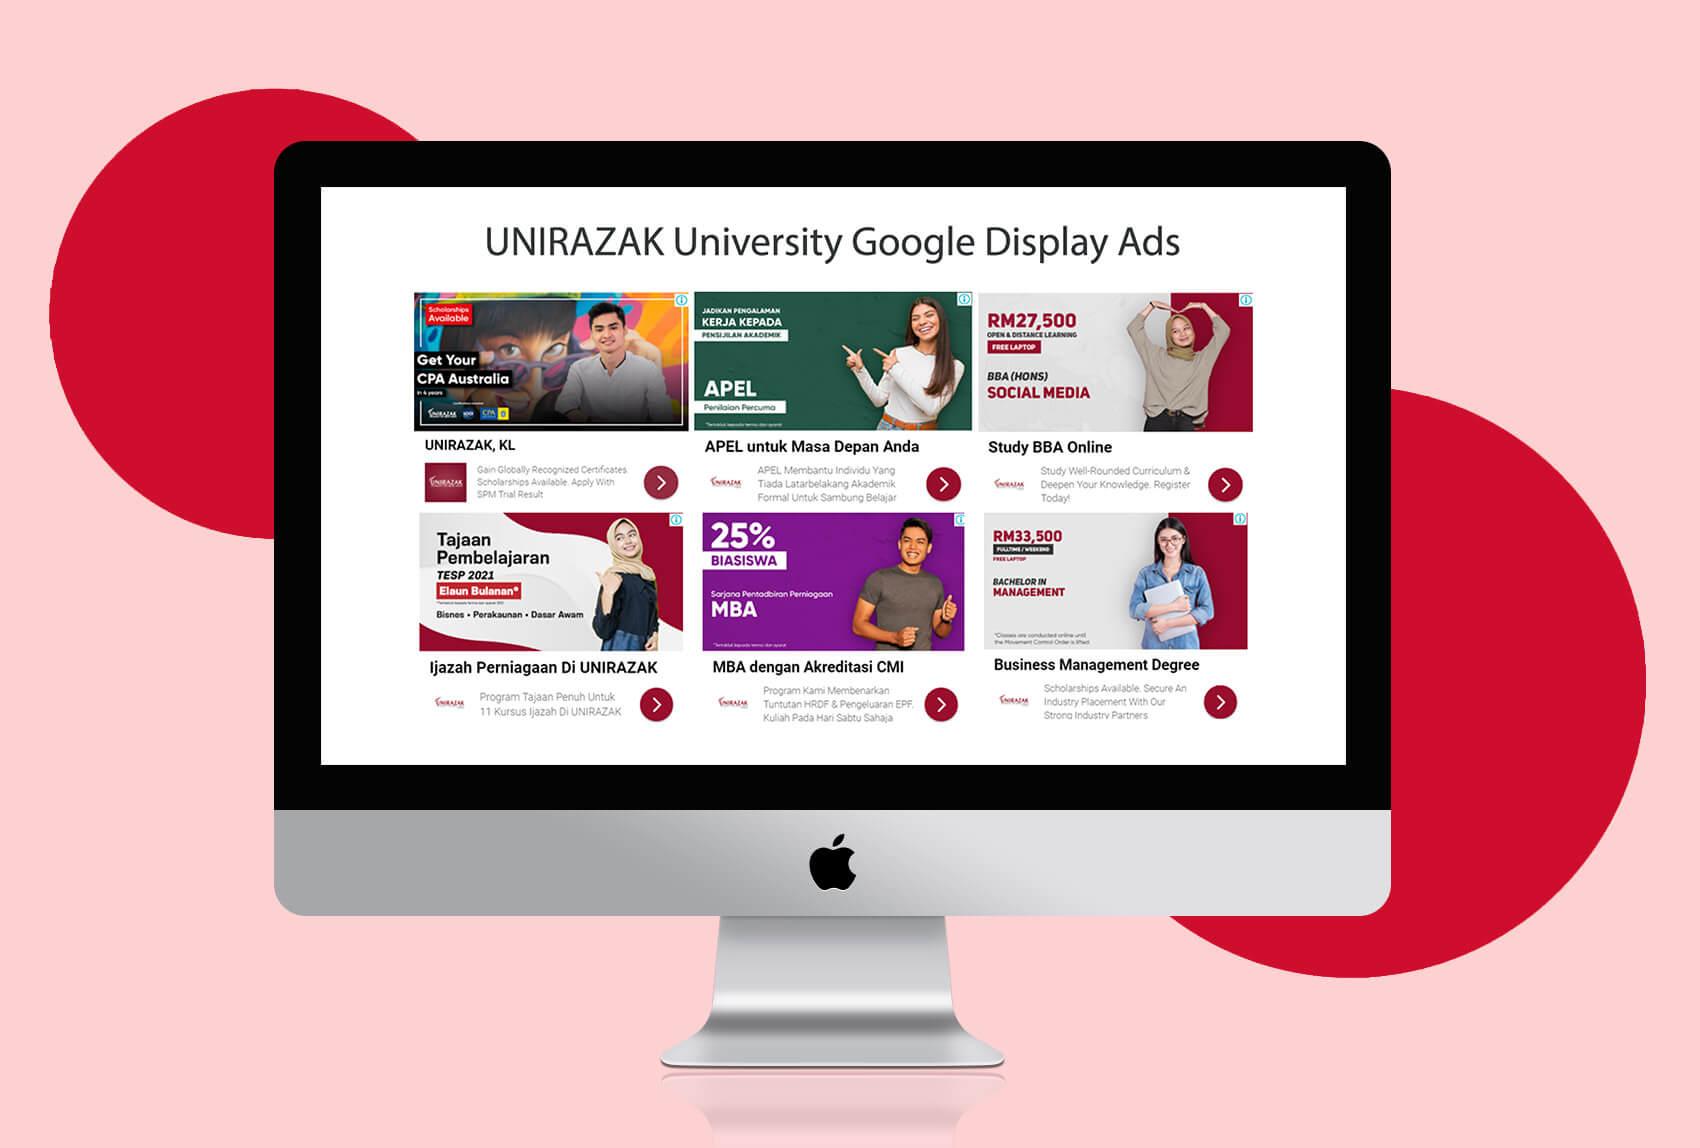 unirazak-google-display-ads